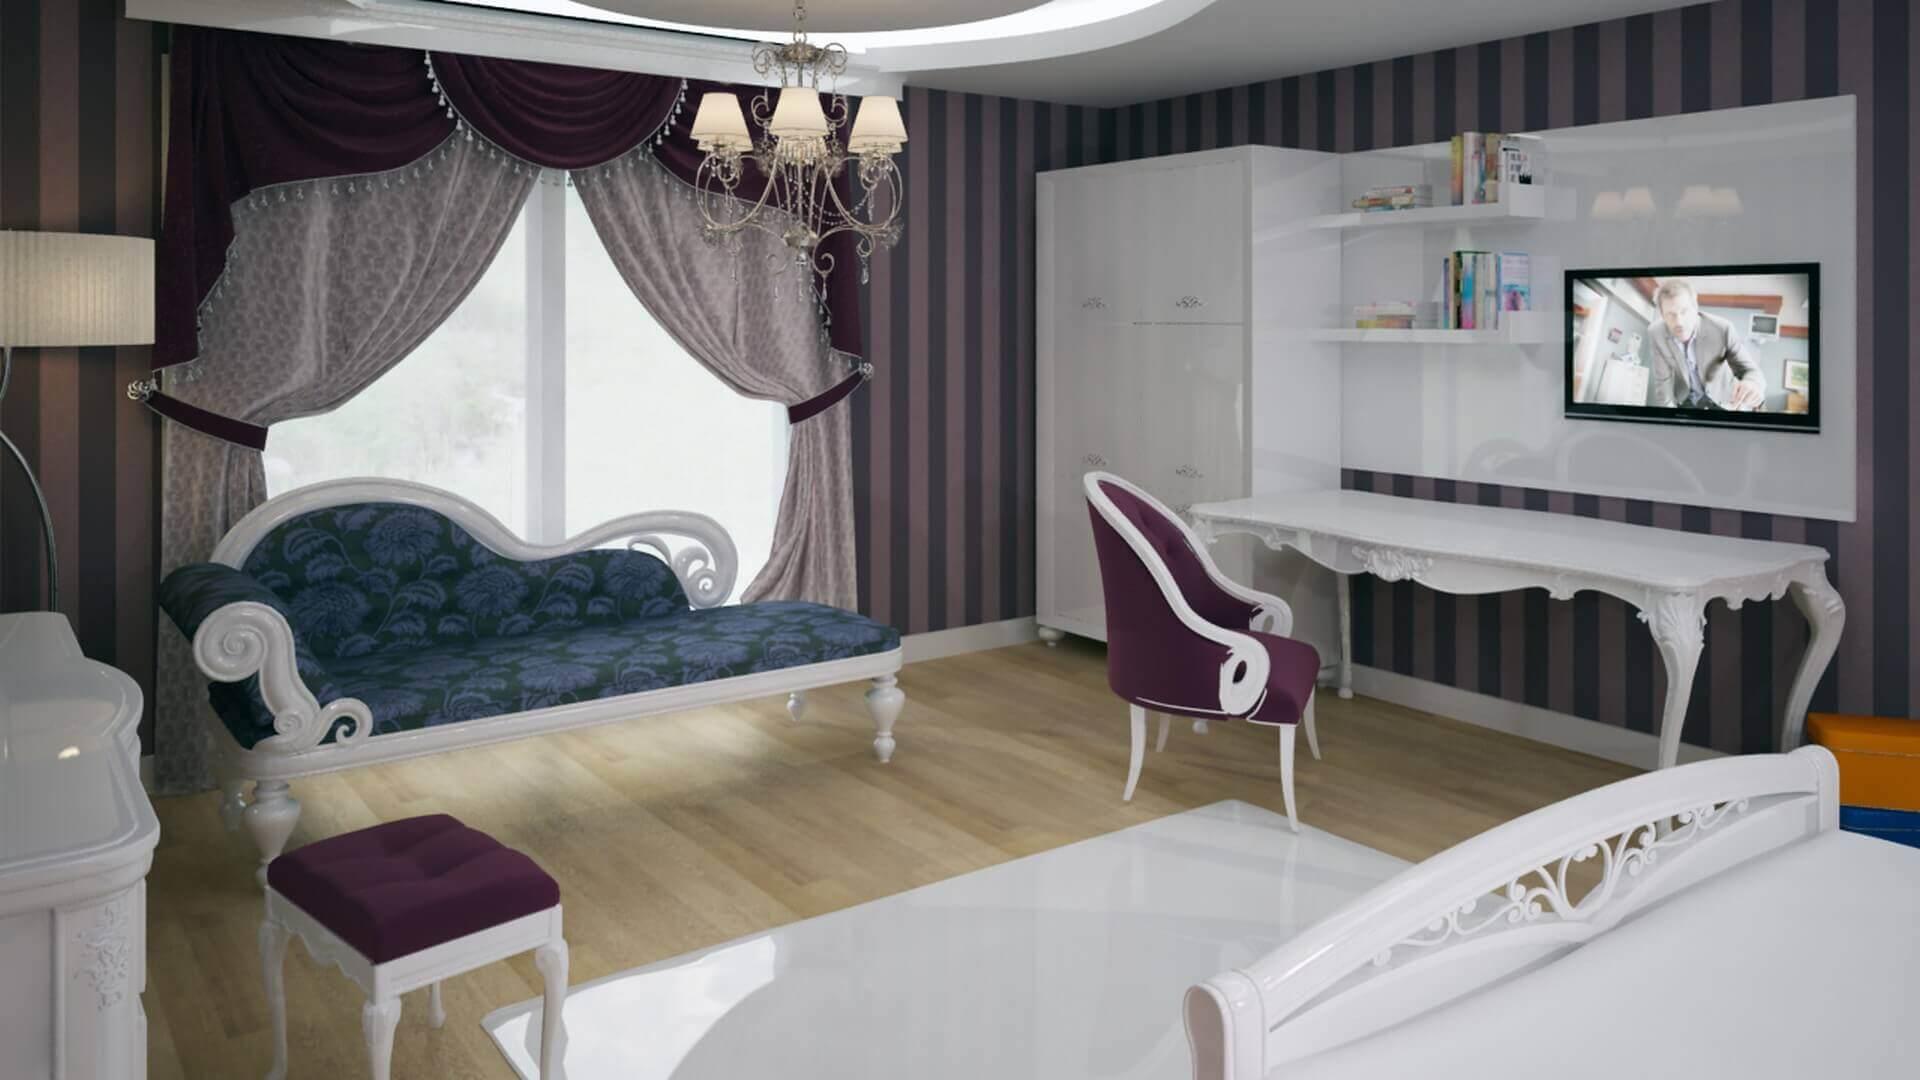 villa dekorasyonu 2925 C. Balta Konutu Konutlar